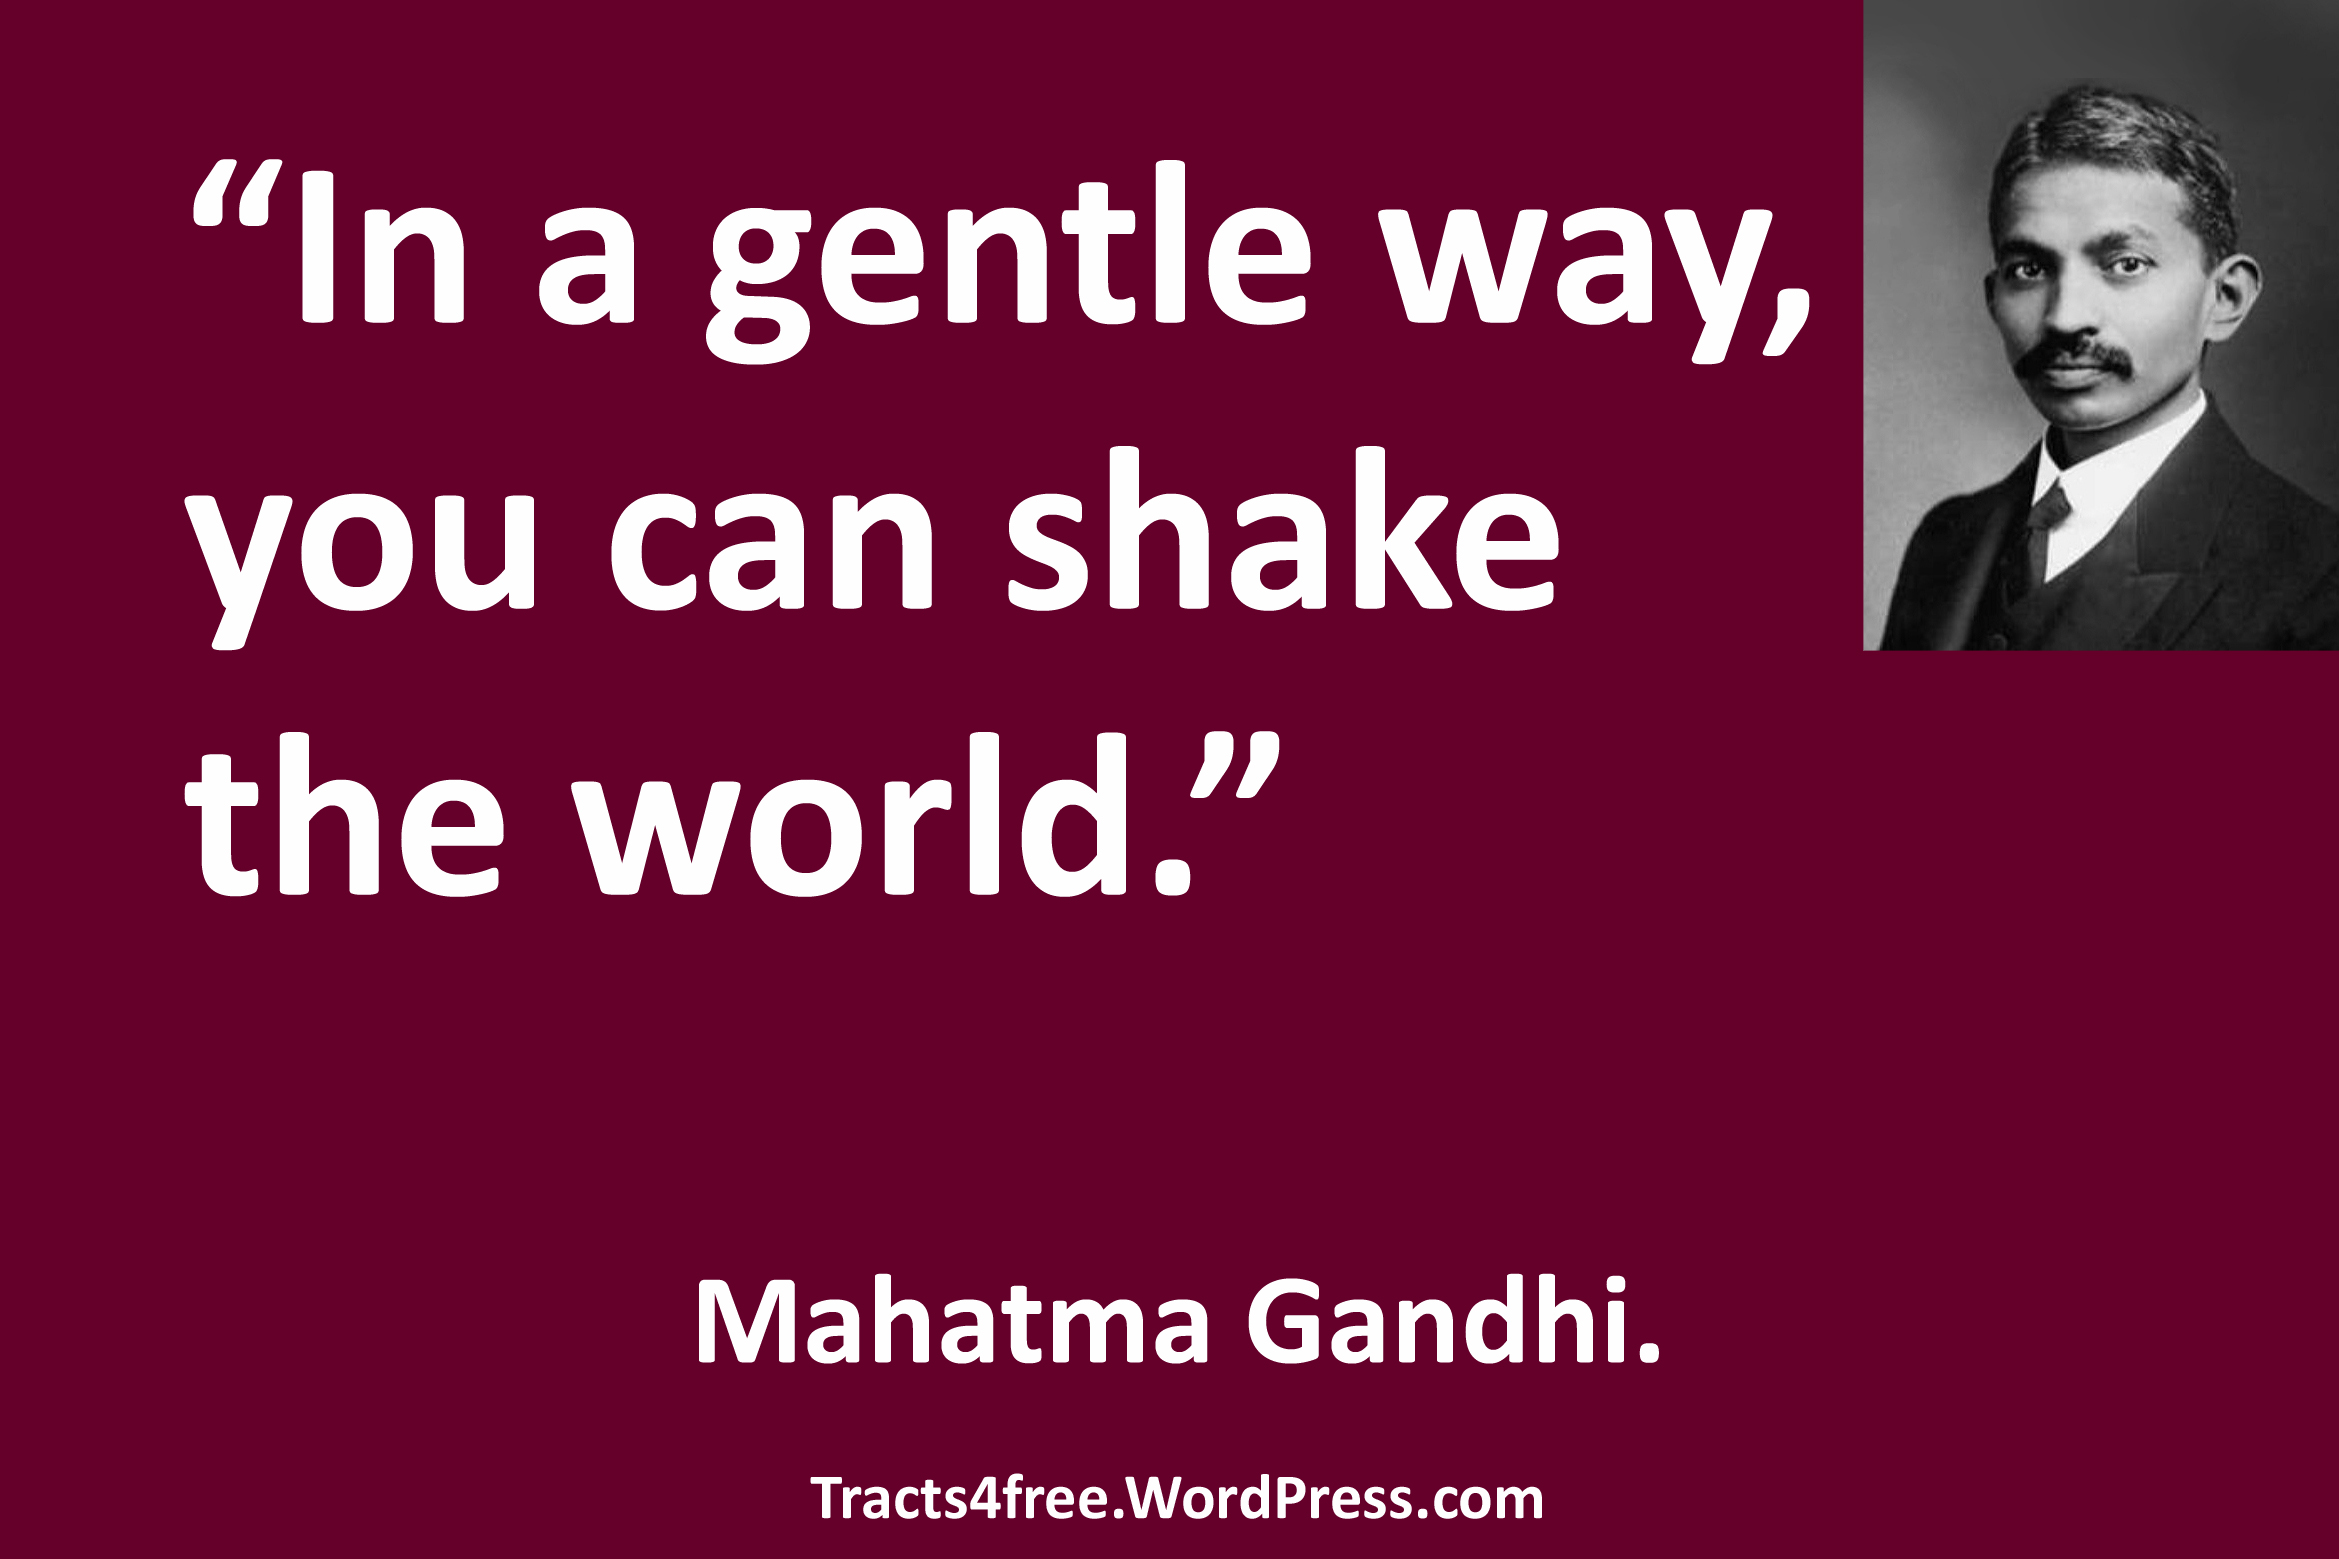 GandhiGentleWay